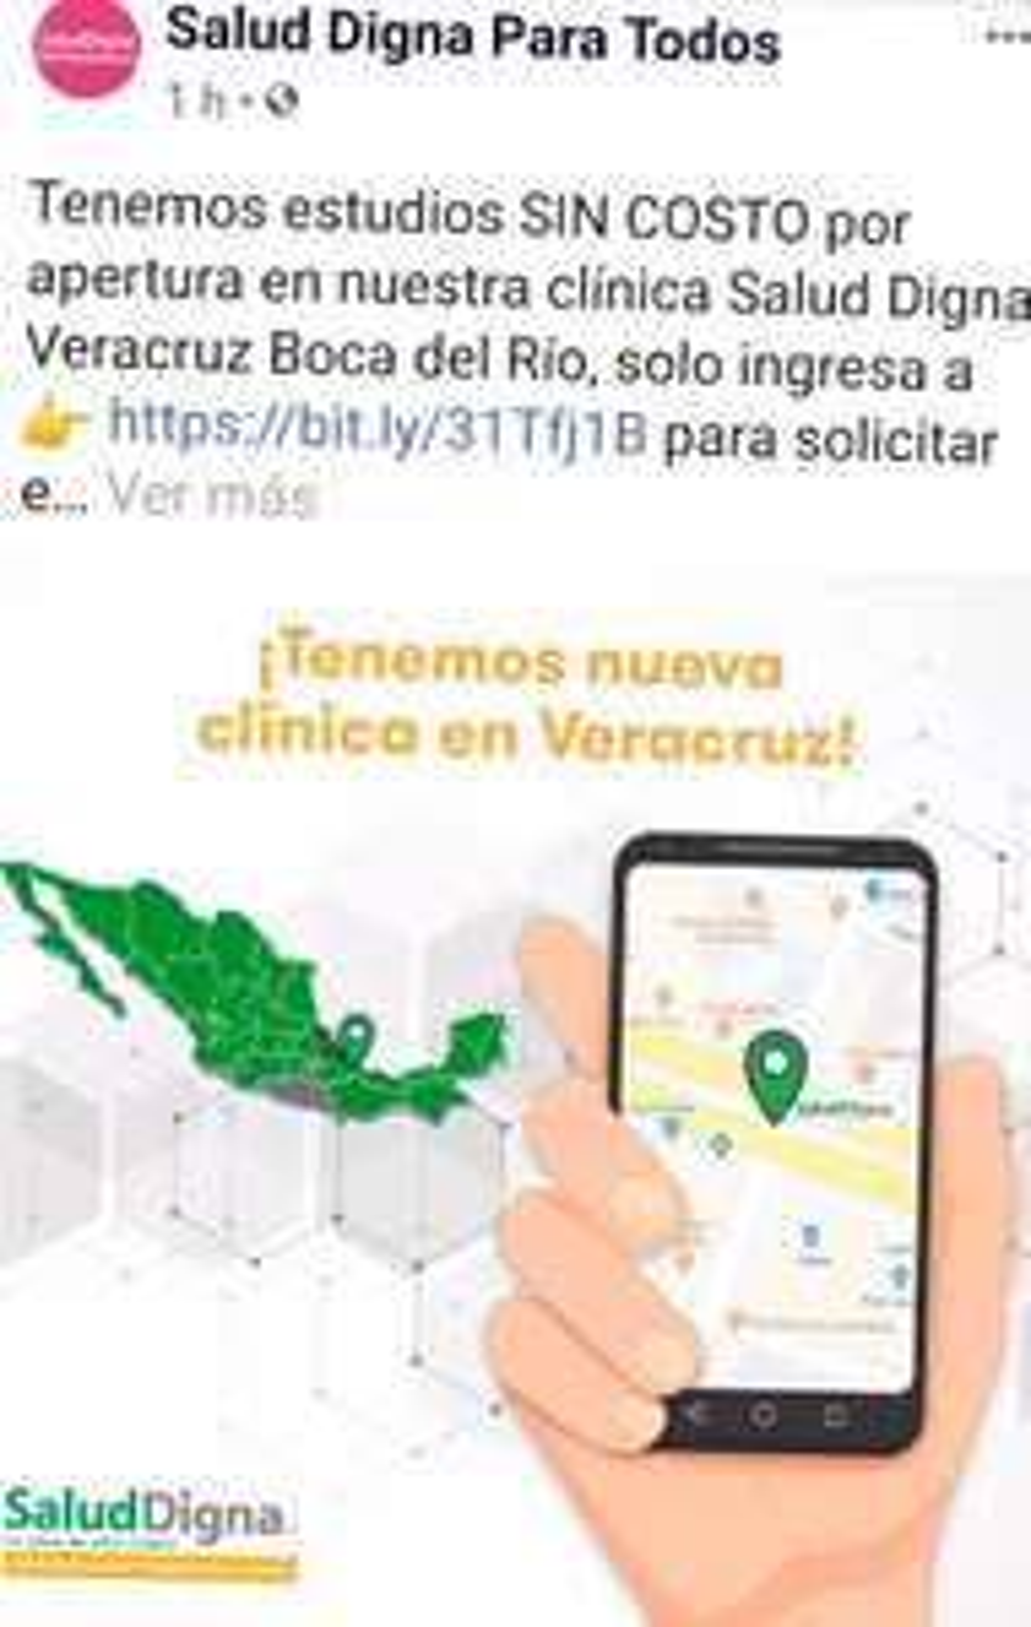 Salud digna VERACRUZ estudios GRATIS